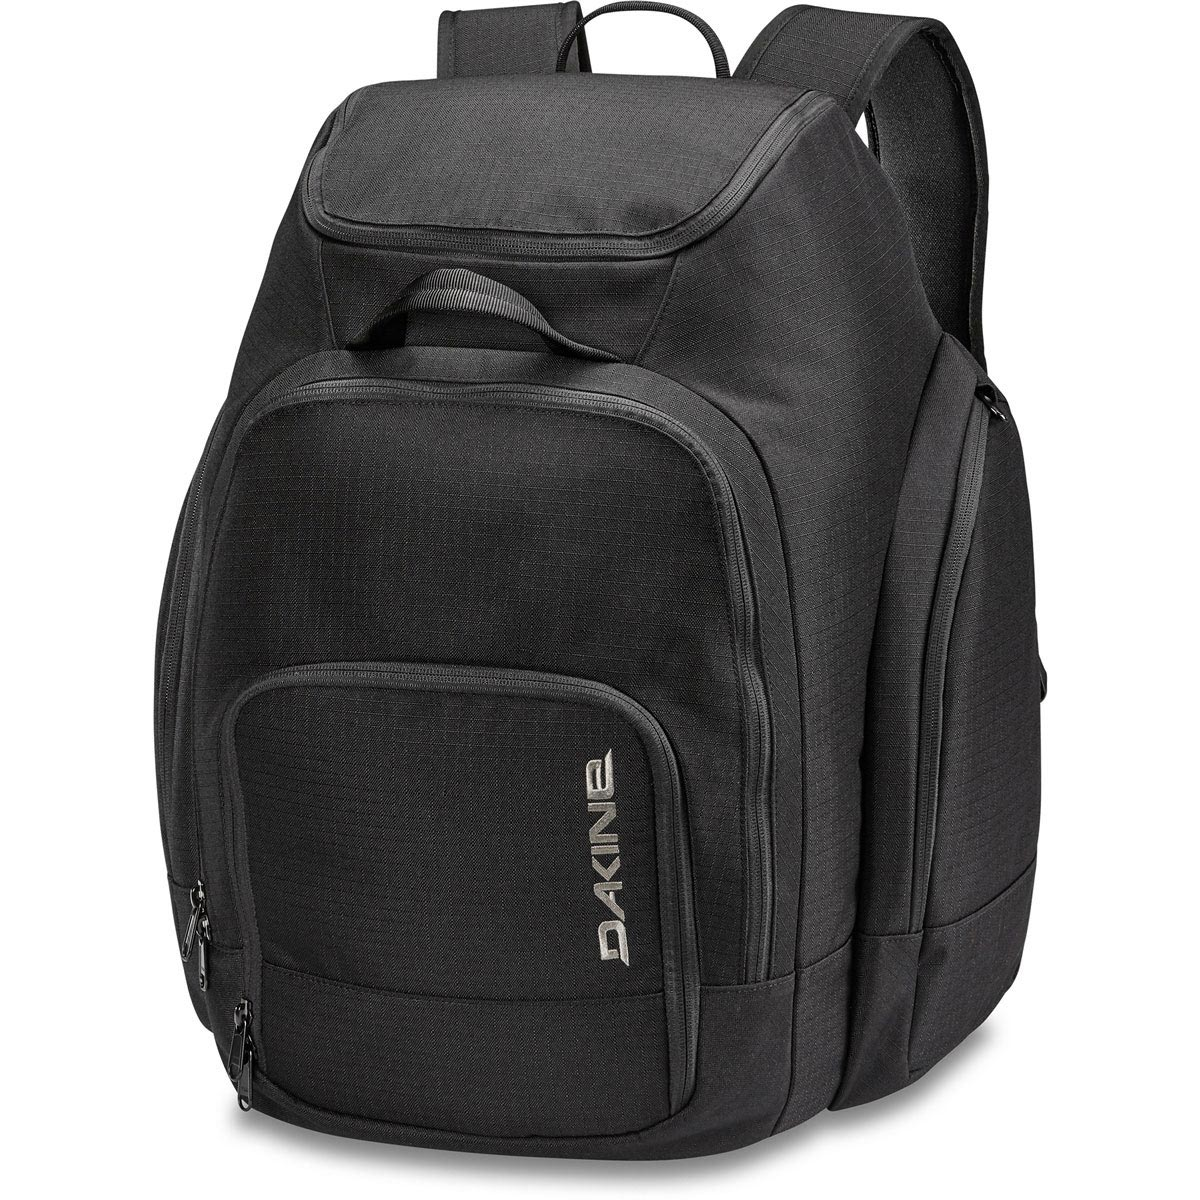 Front View - Dakine boot pack DLX 55L - Black